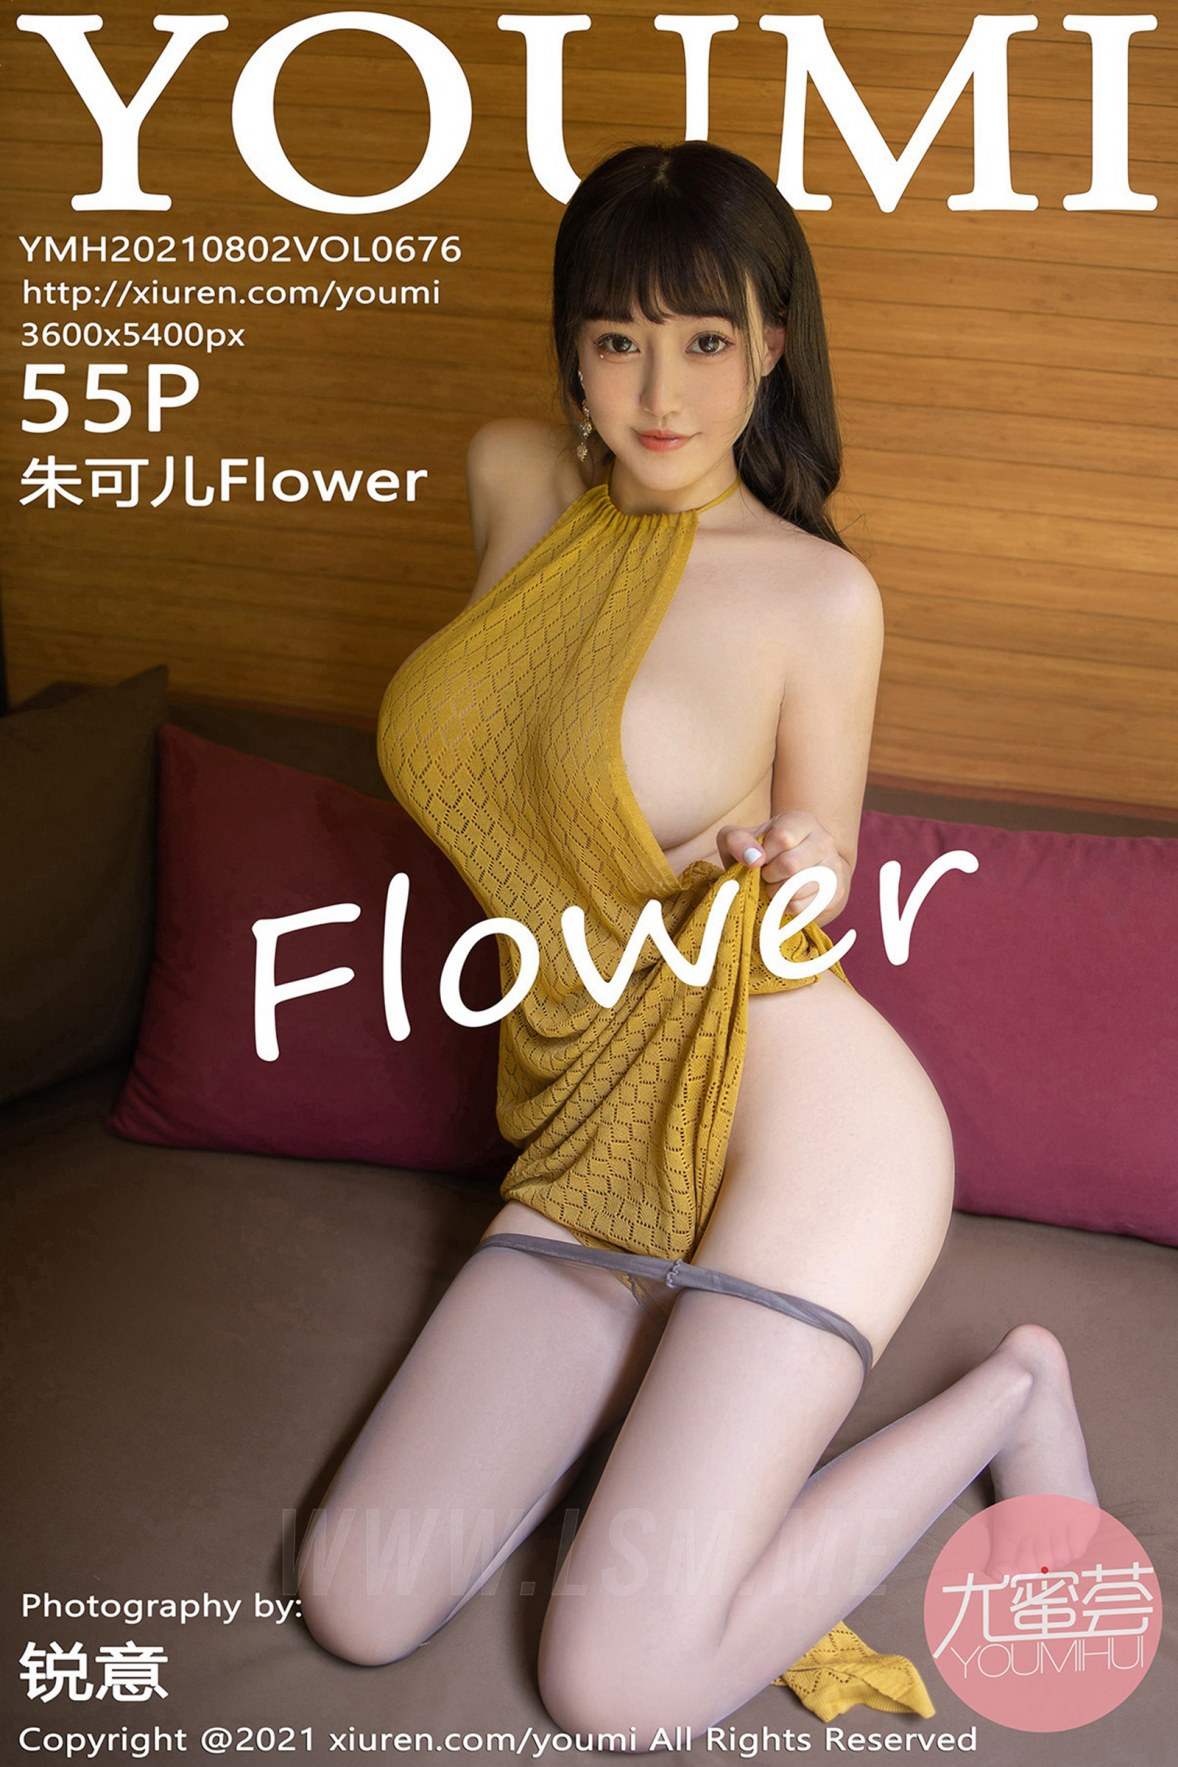 676 056 e4x 1200 1800 - YOUMI 尤蜜荟 Vol.676  丰满身姿 朱可儿Flower 桂林旅拍111 - 尤蜜荟 -【免费在线写真】【丽人丝语】